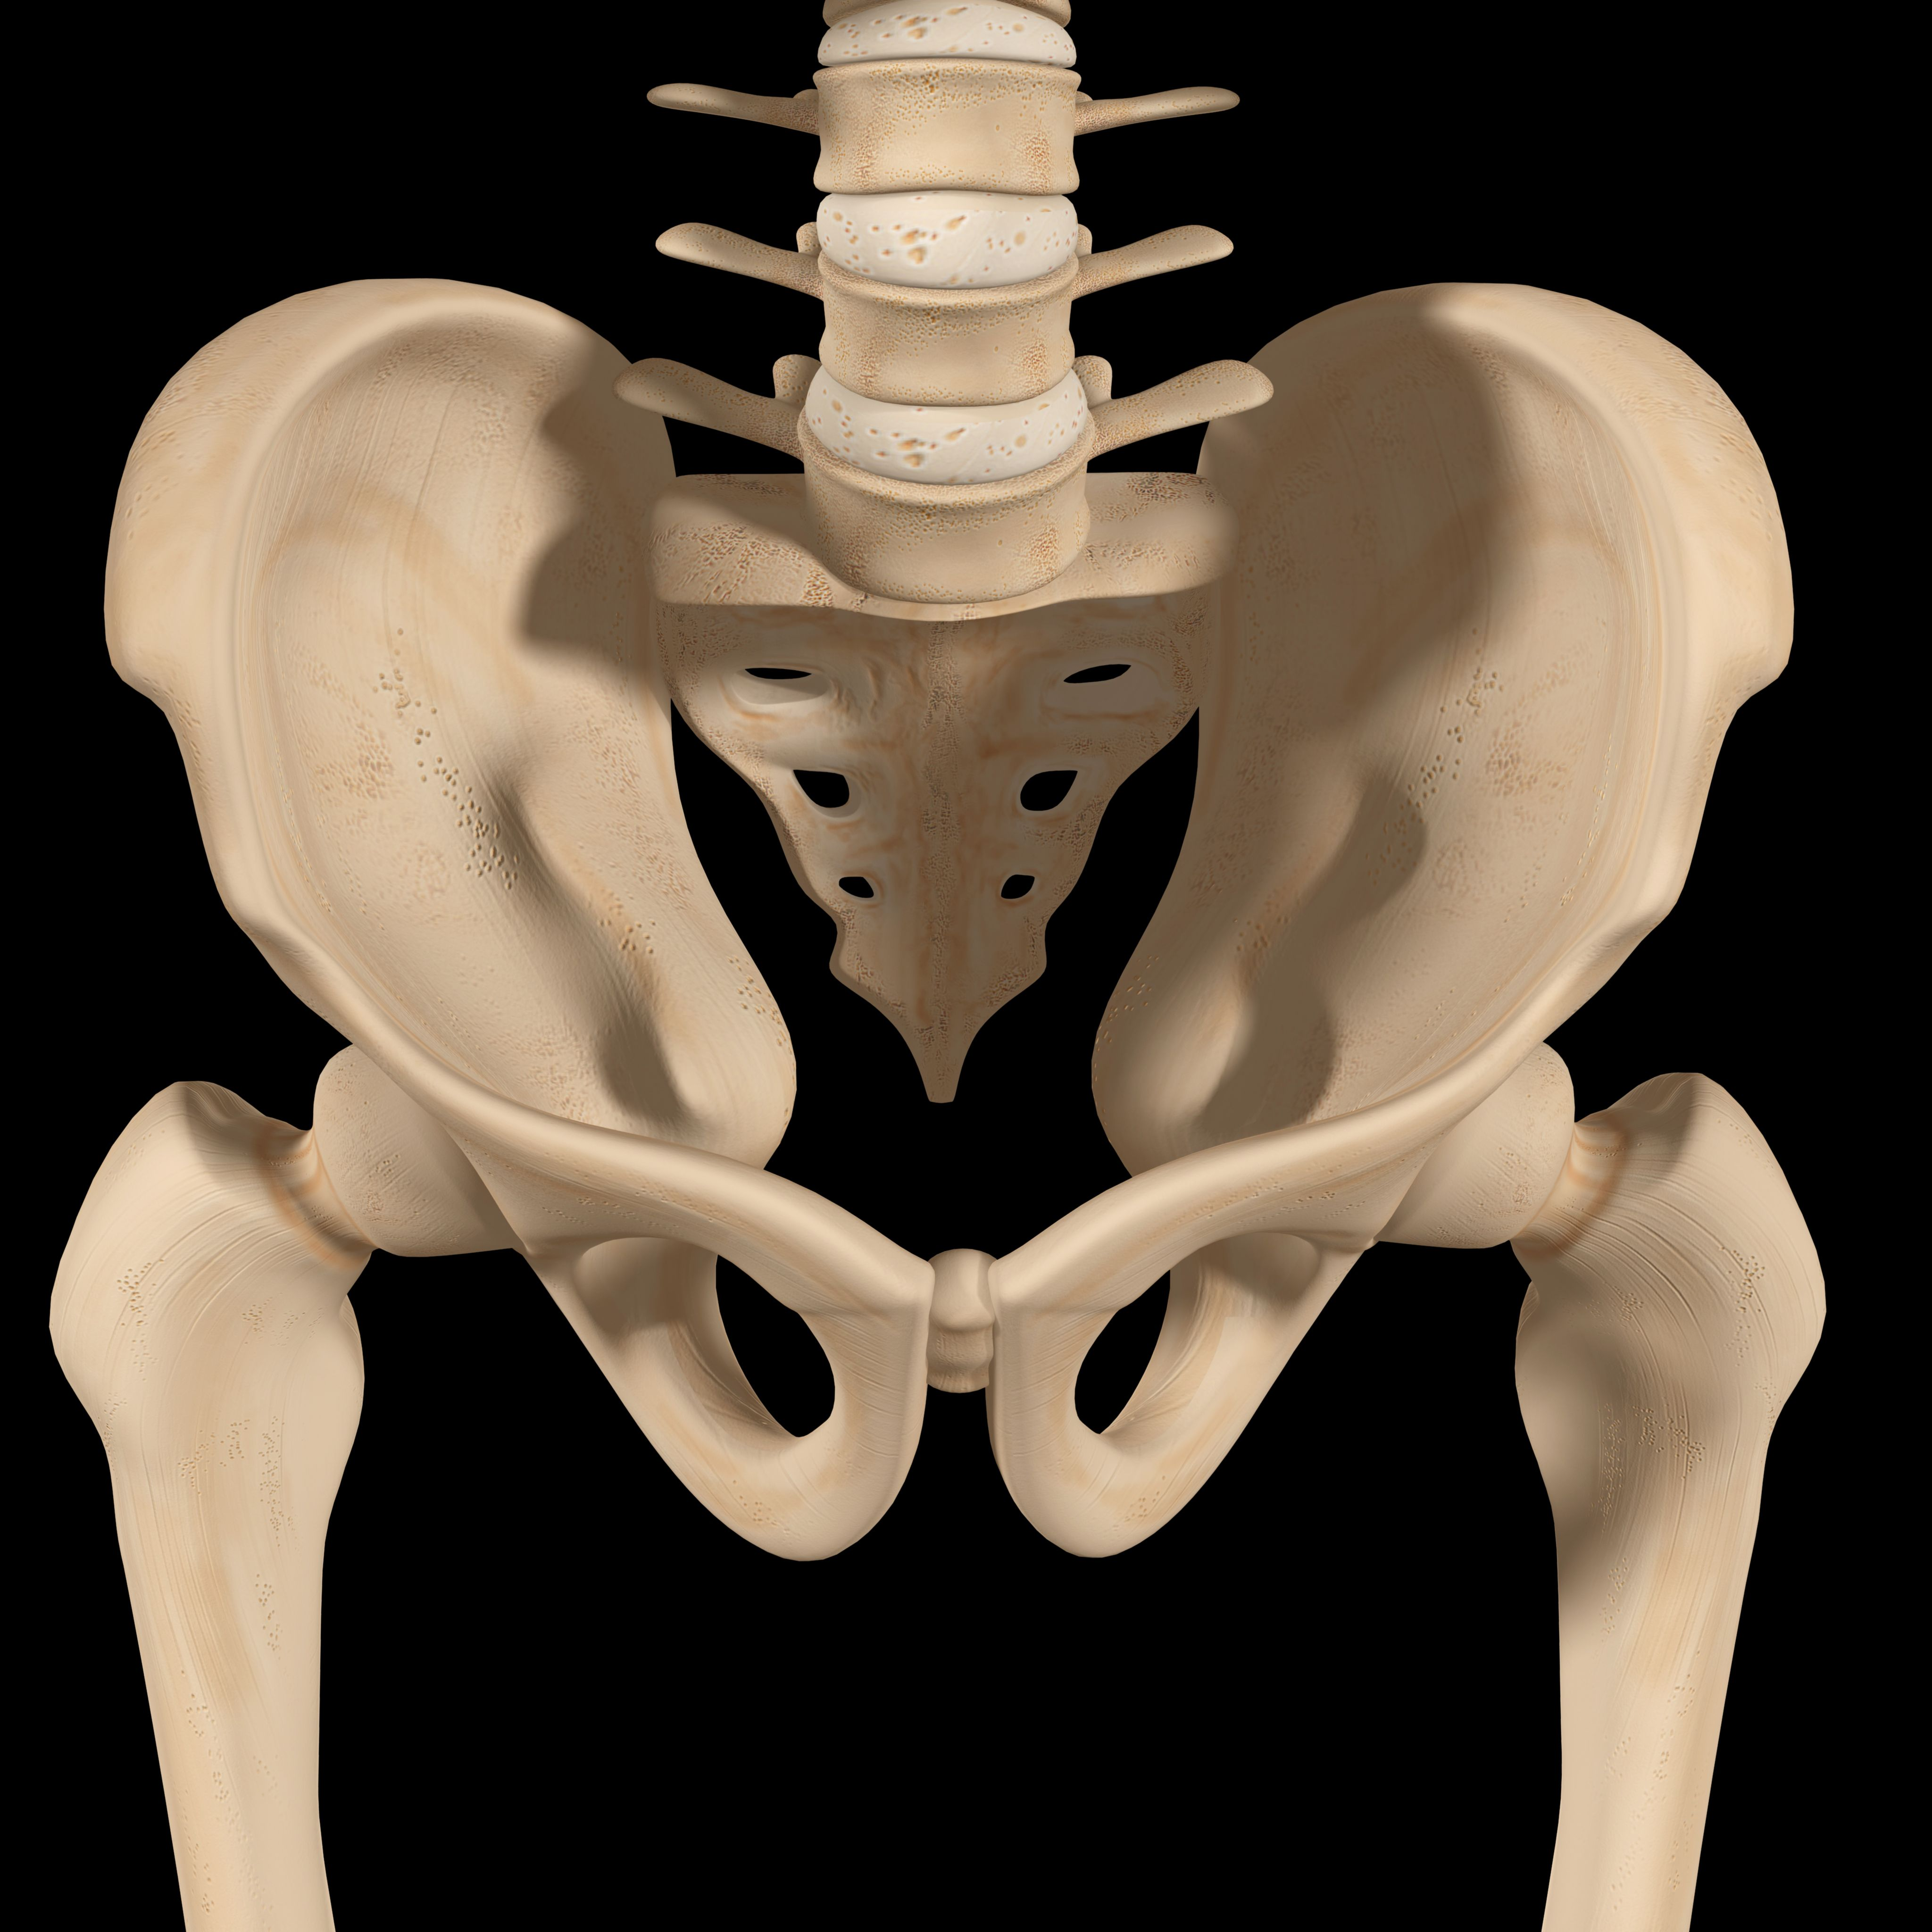 A skeleton of the pelvis, sacrum, lumbar spine, hip joints and femur bones.